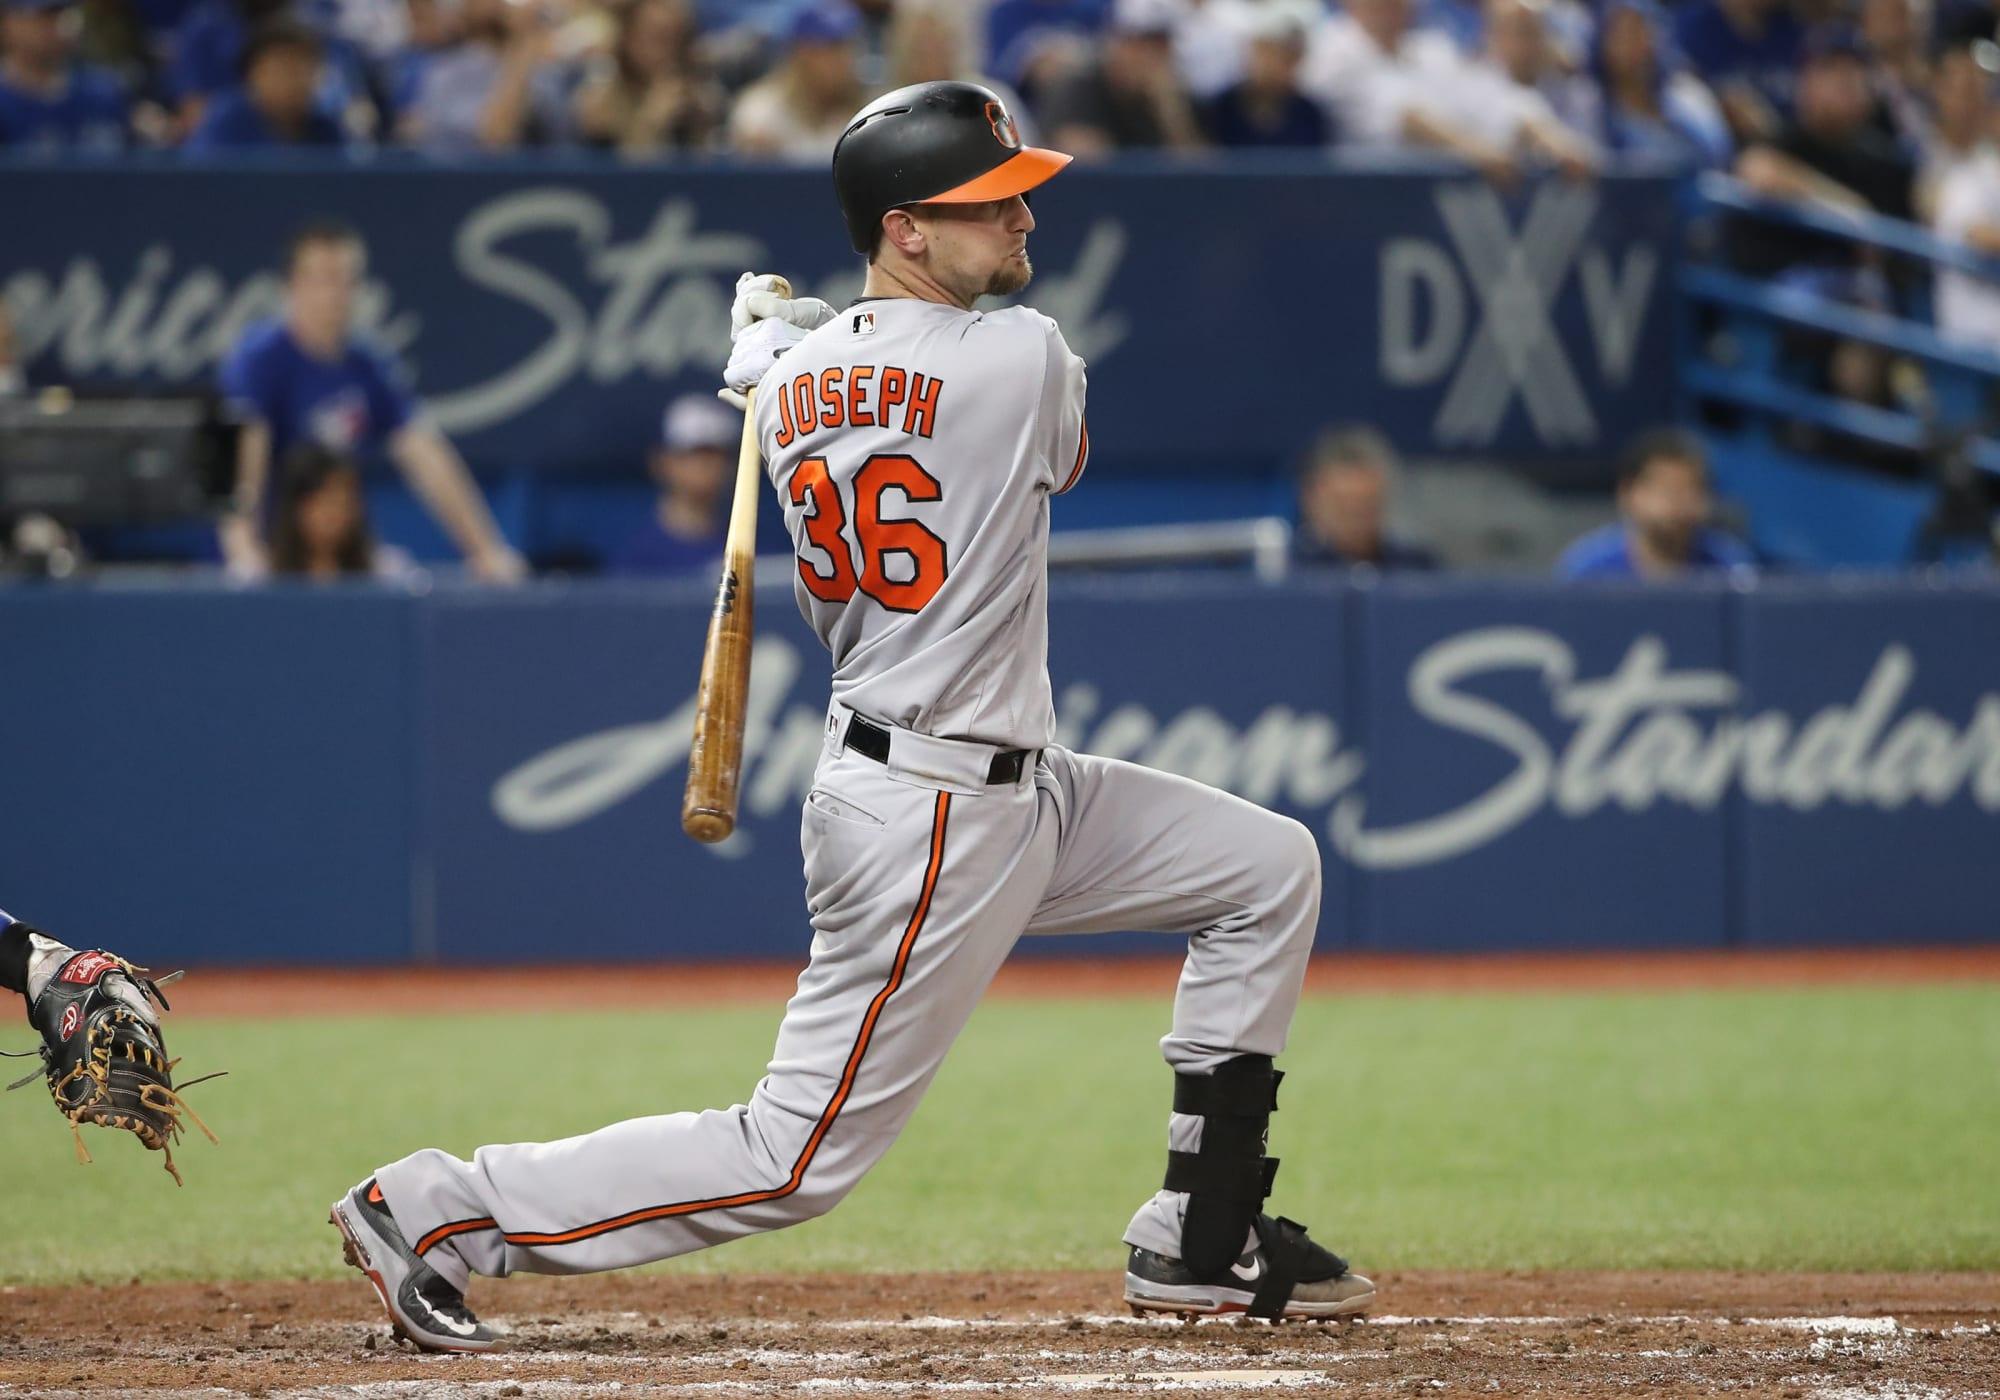 Caleb Joseph Baltimore Orioles Baseball Player Jersey